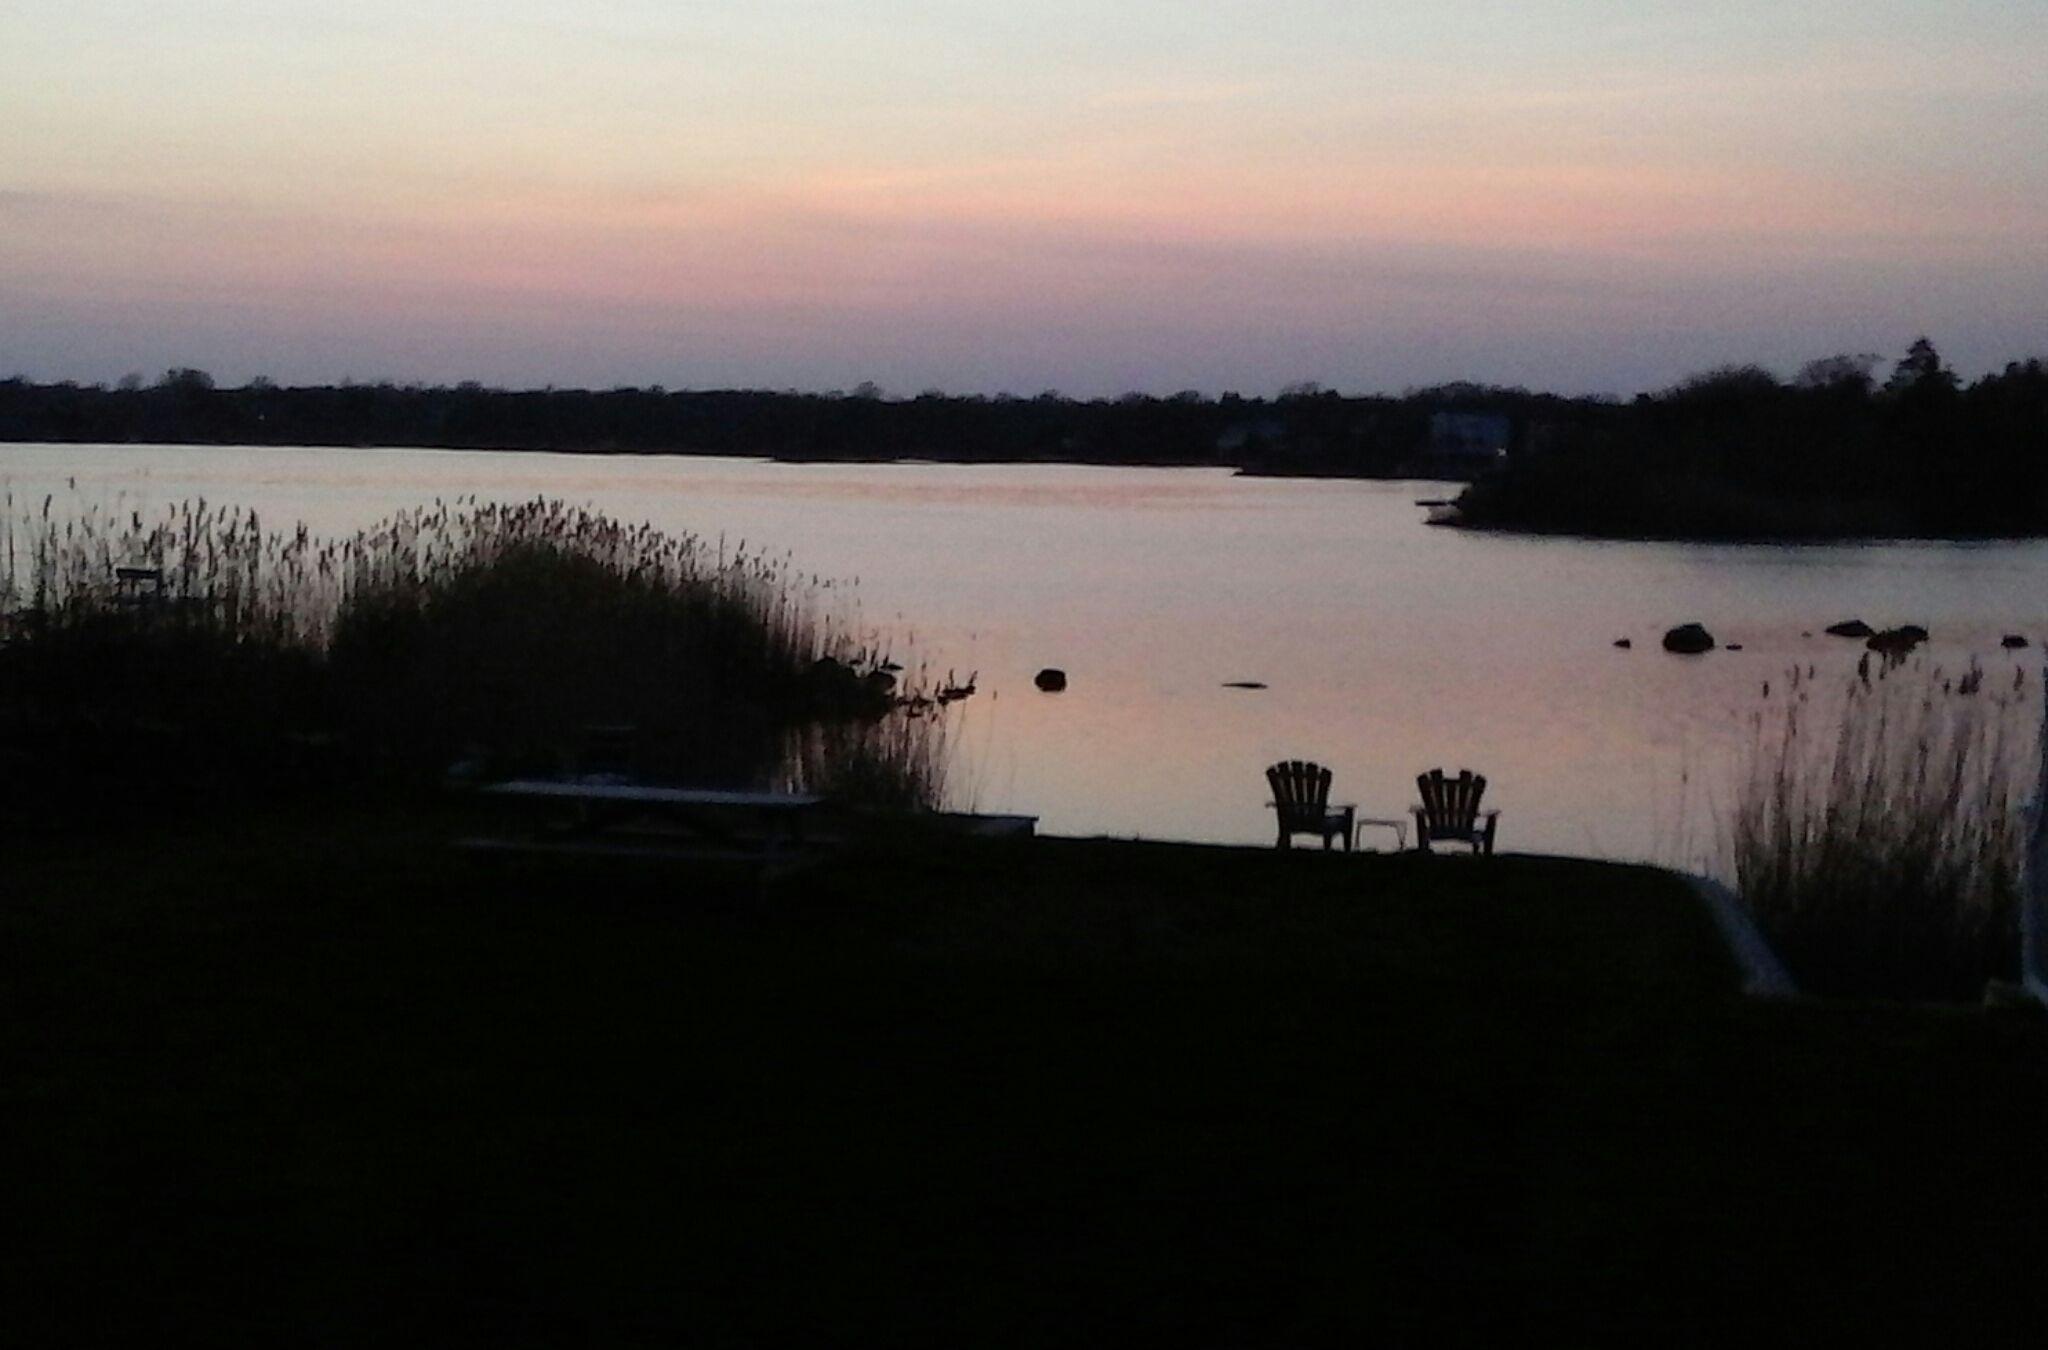 Tranquil night overlooking Green Hill Pond, Charlestown, RI